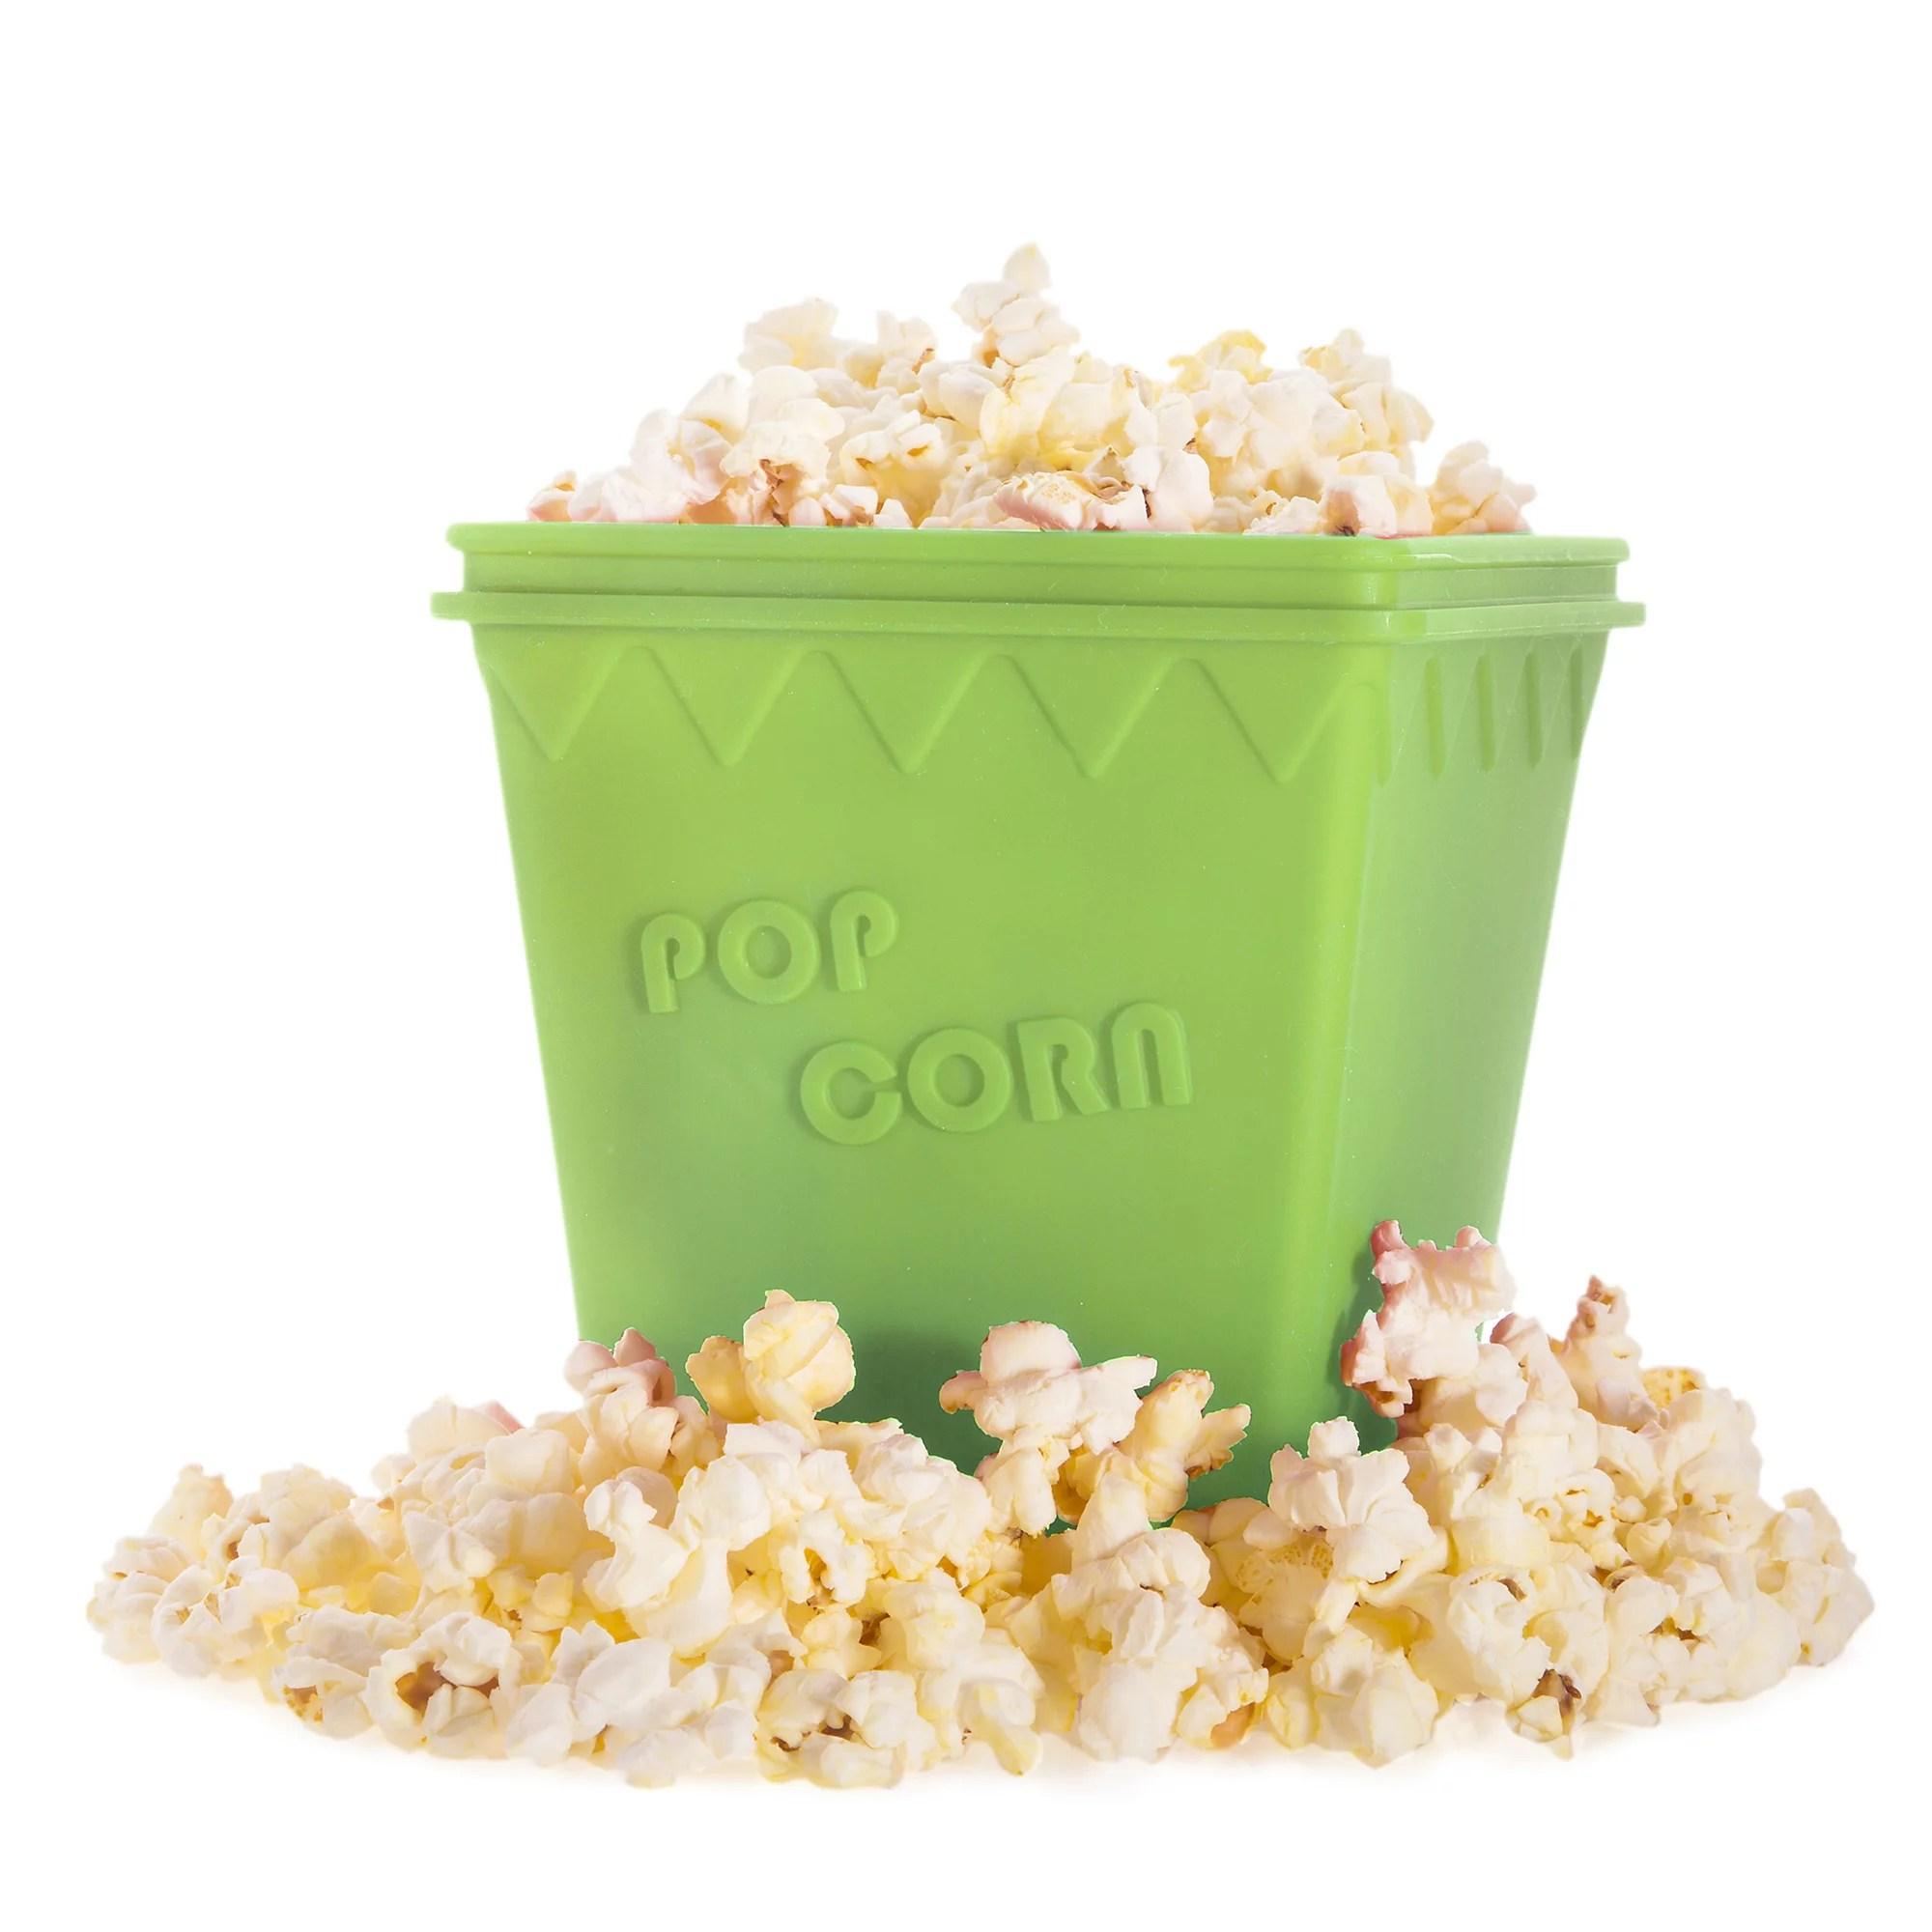 joie msc microwave popcorn maker 4